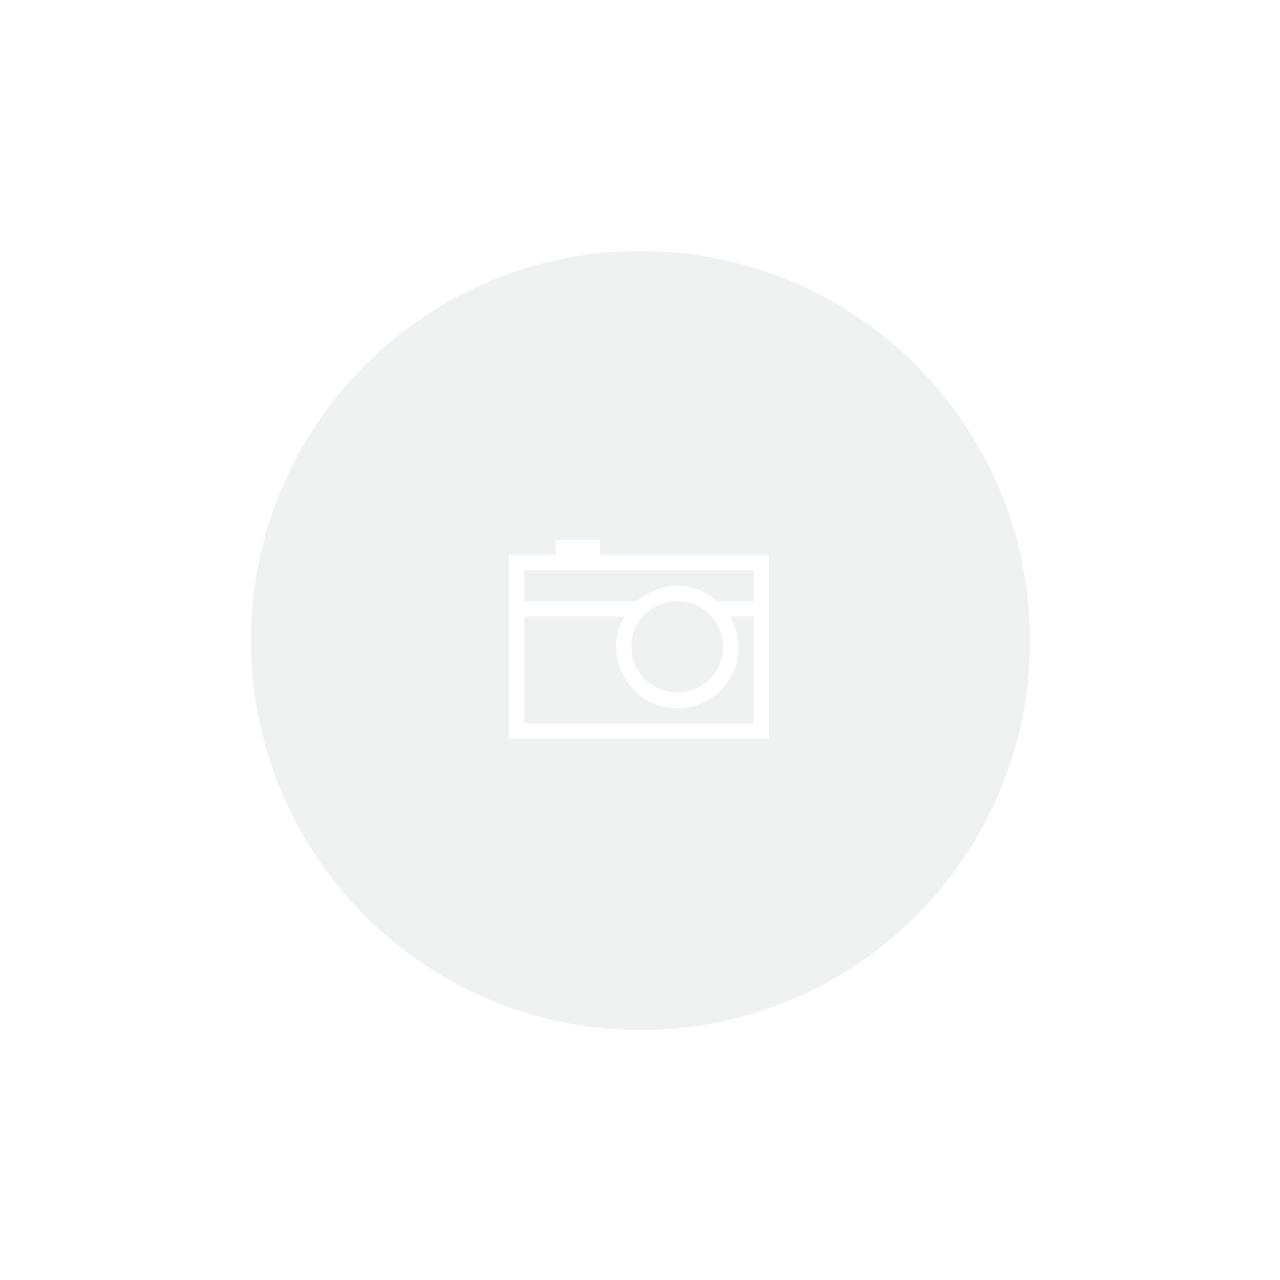 Cozi-vapore Inox 20cm 3,10 Litros Duo Silicone Tramontina